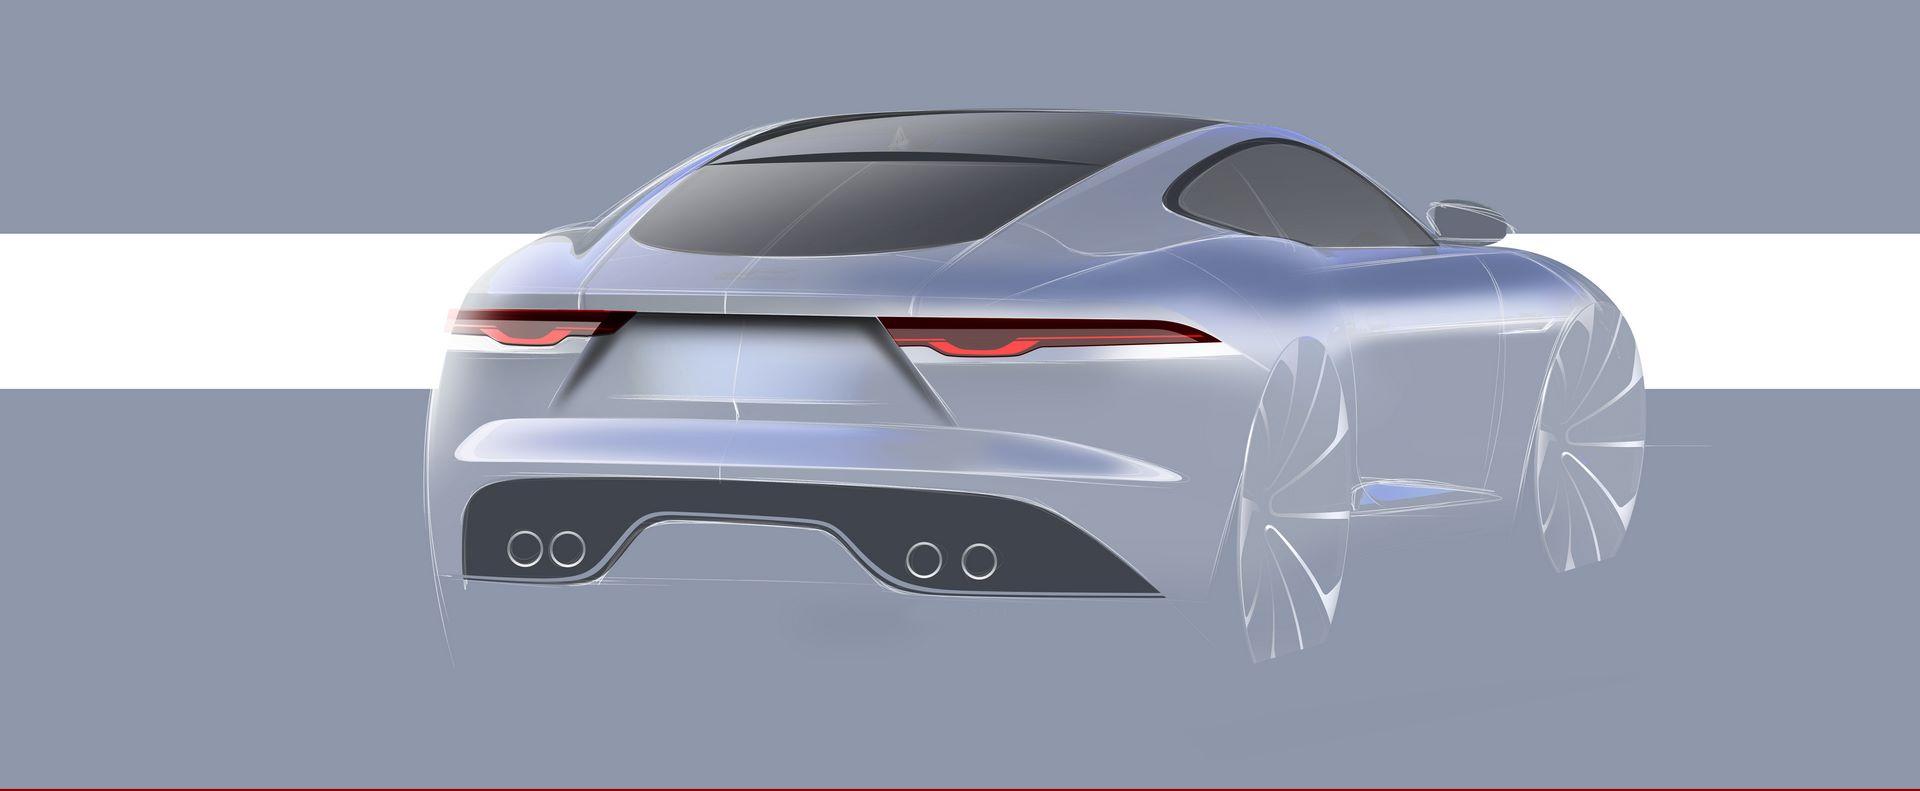 Jaguar-F-Type-facelift-2020-47